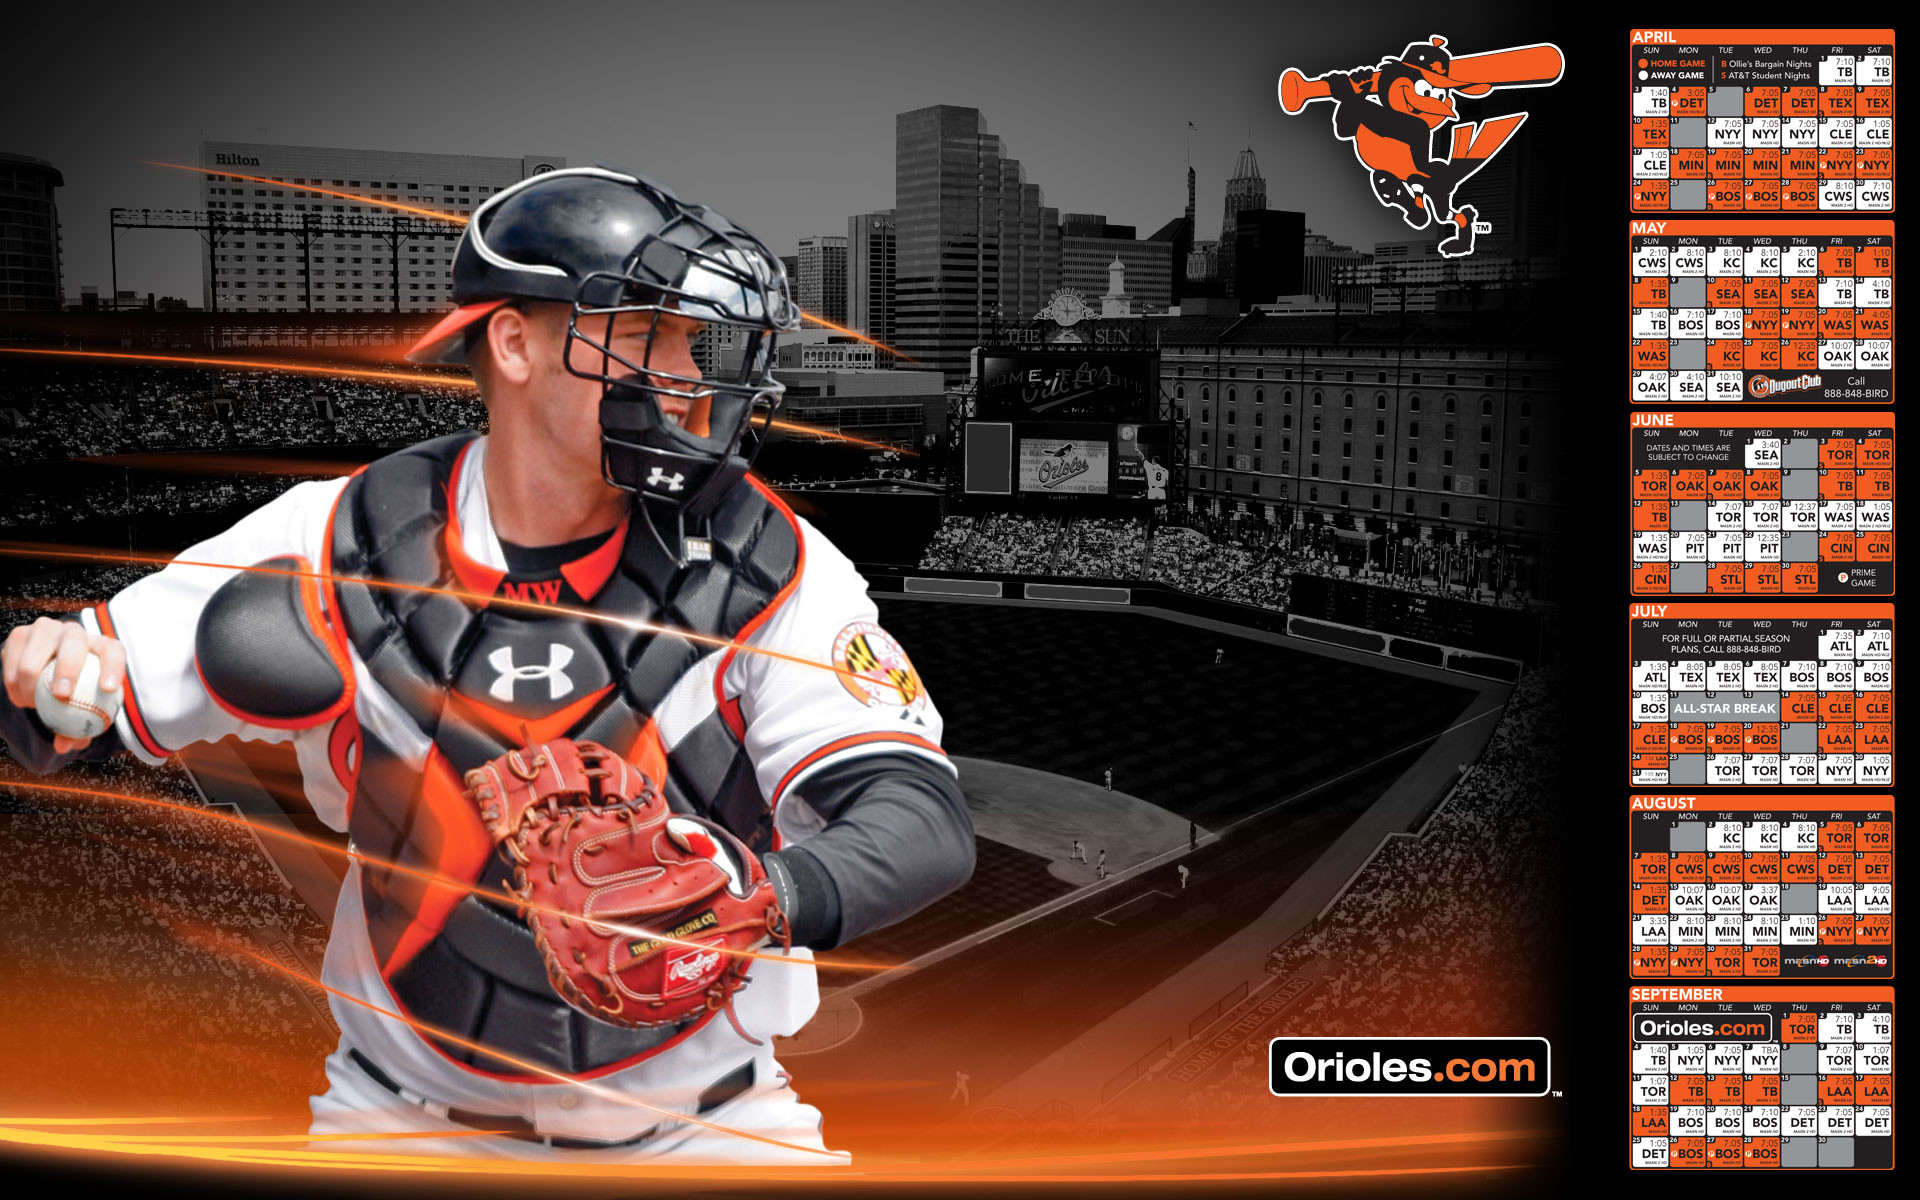 Baltimore Orioles Backgrounds wallpaper – 378371